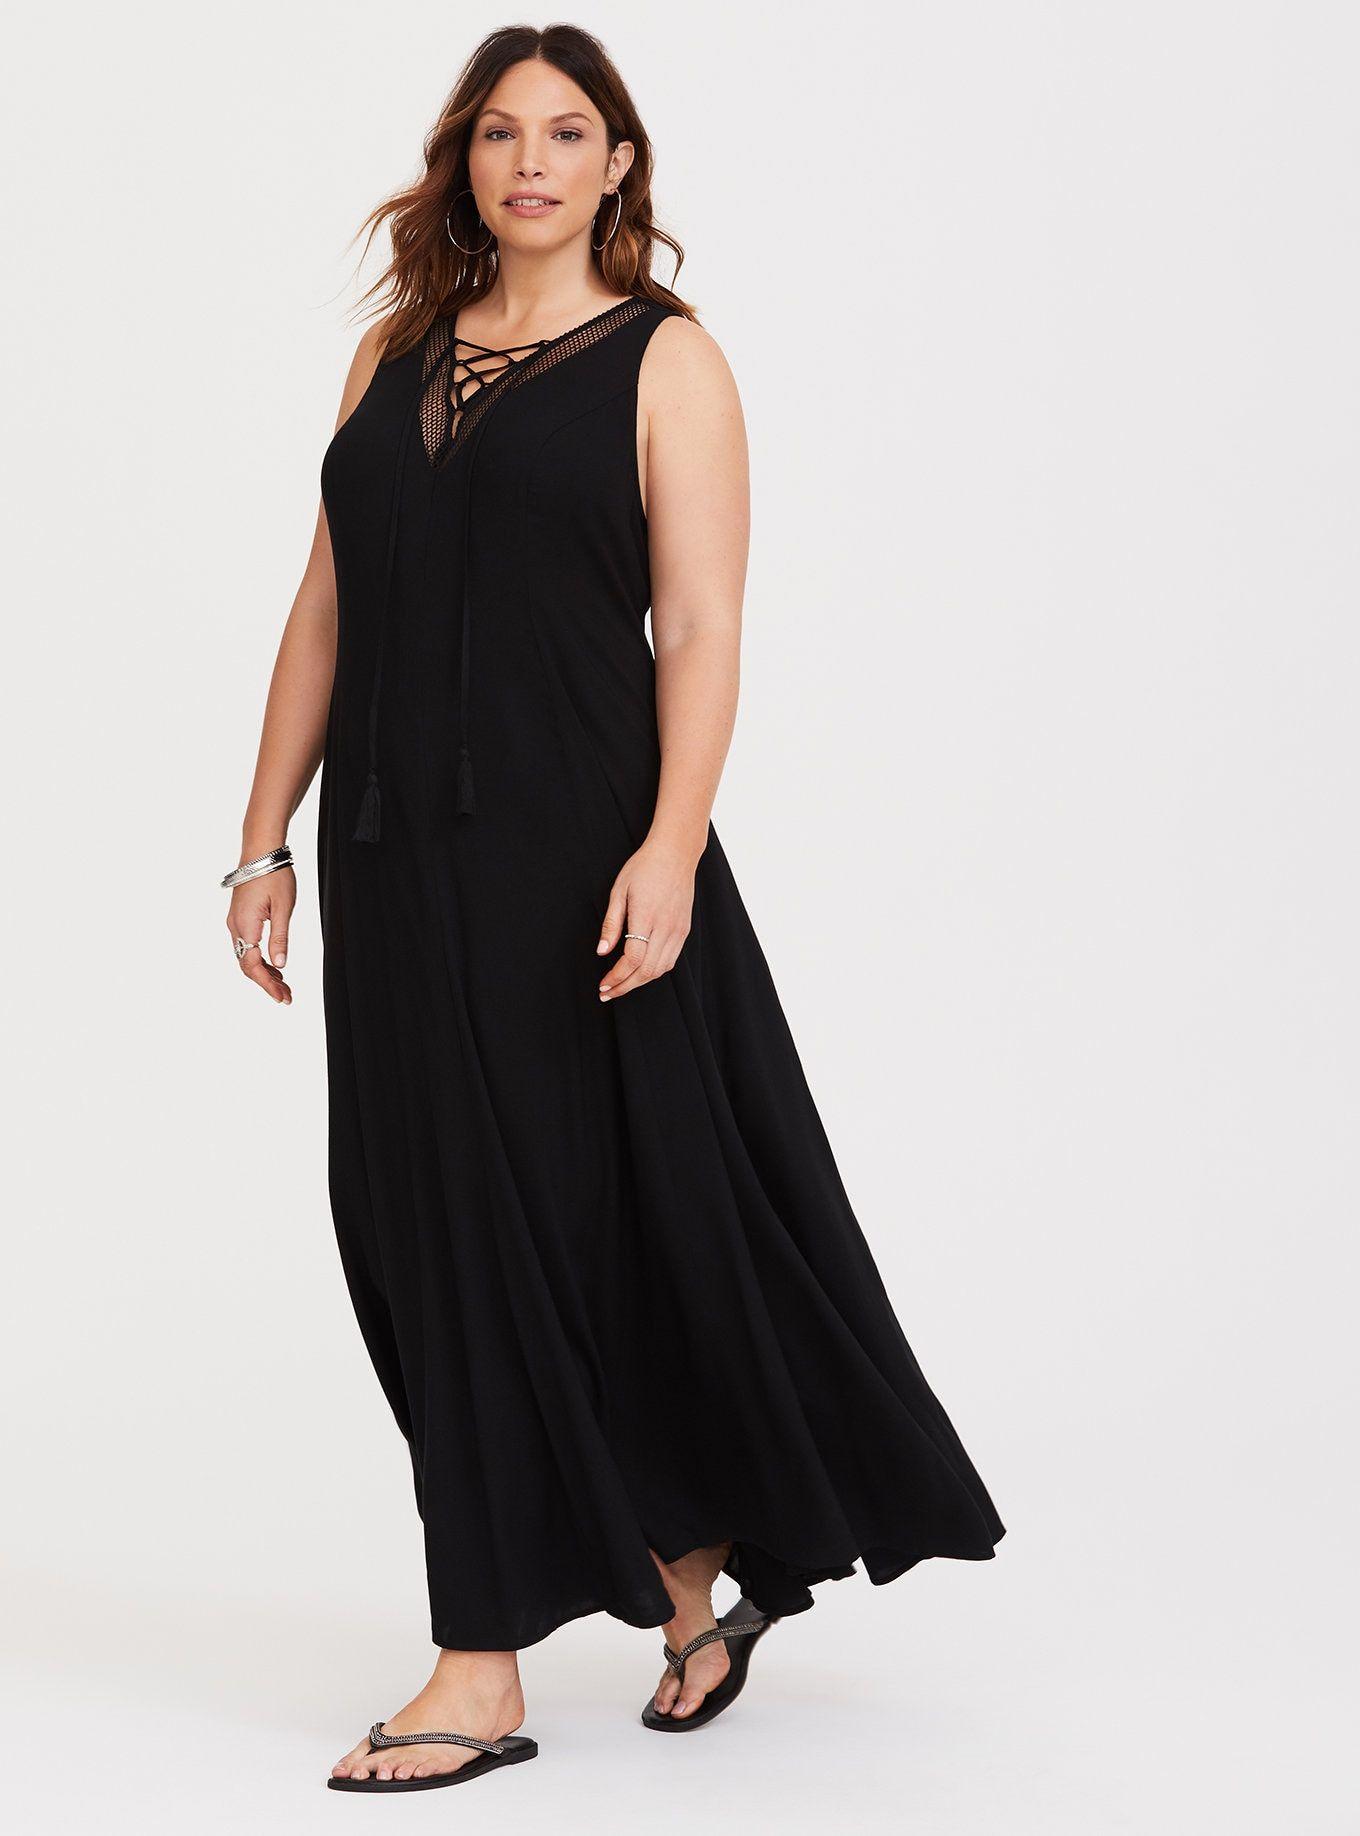 4bba6a9fd37 Black Lace-Up Challis Trapeze Maxi Dress